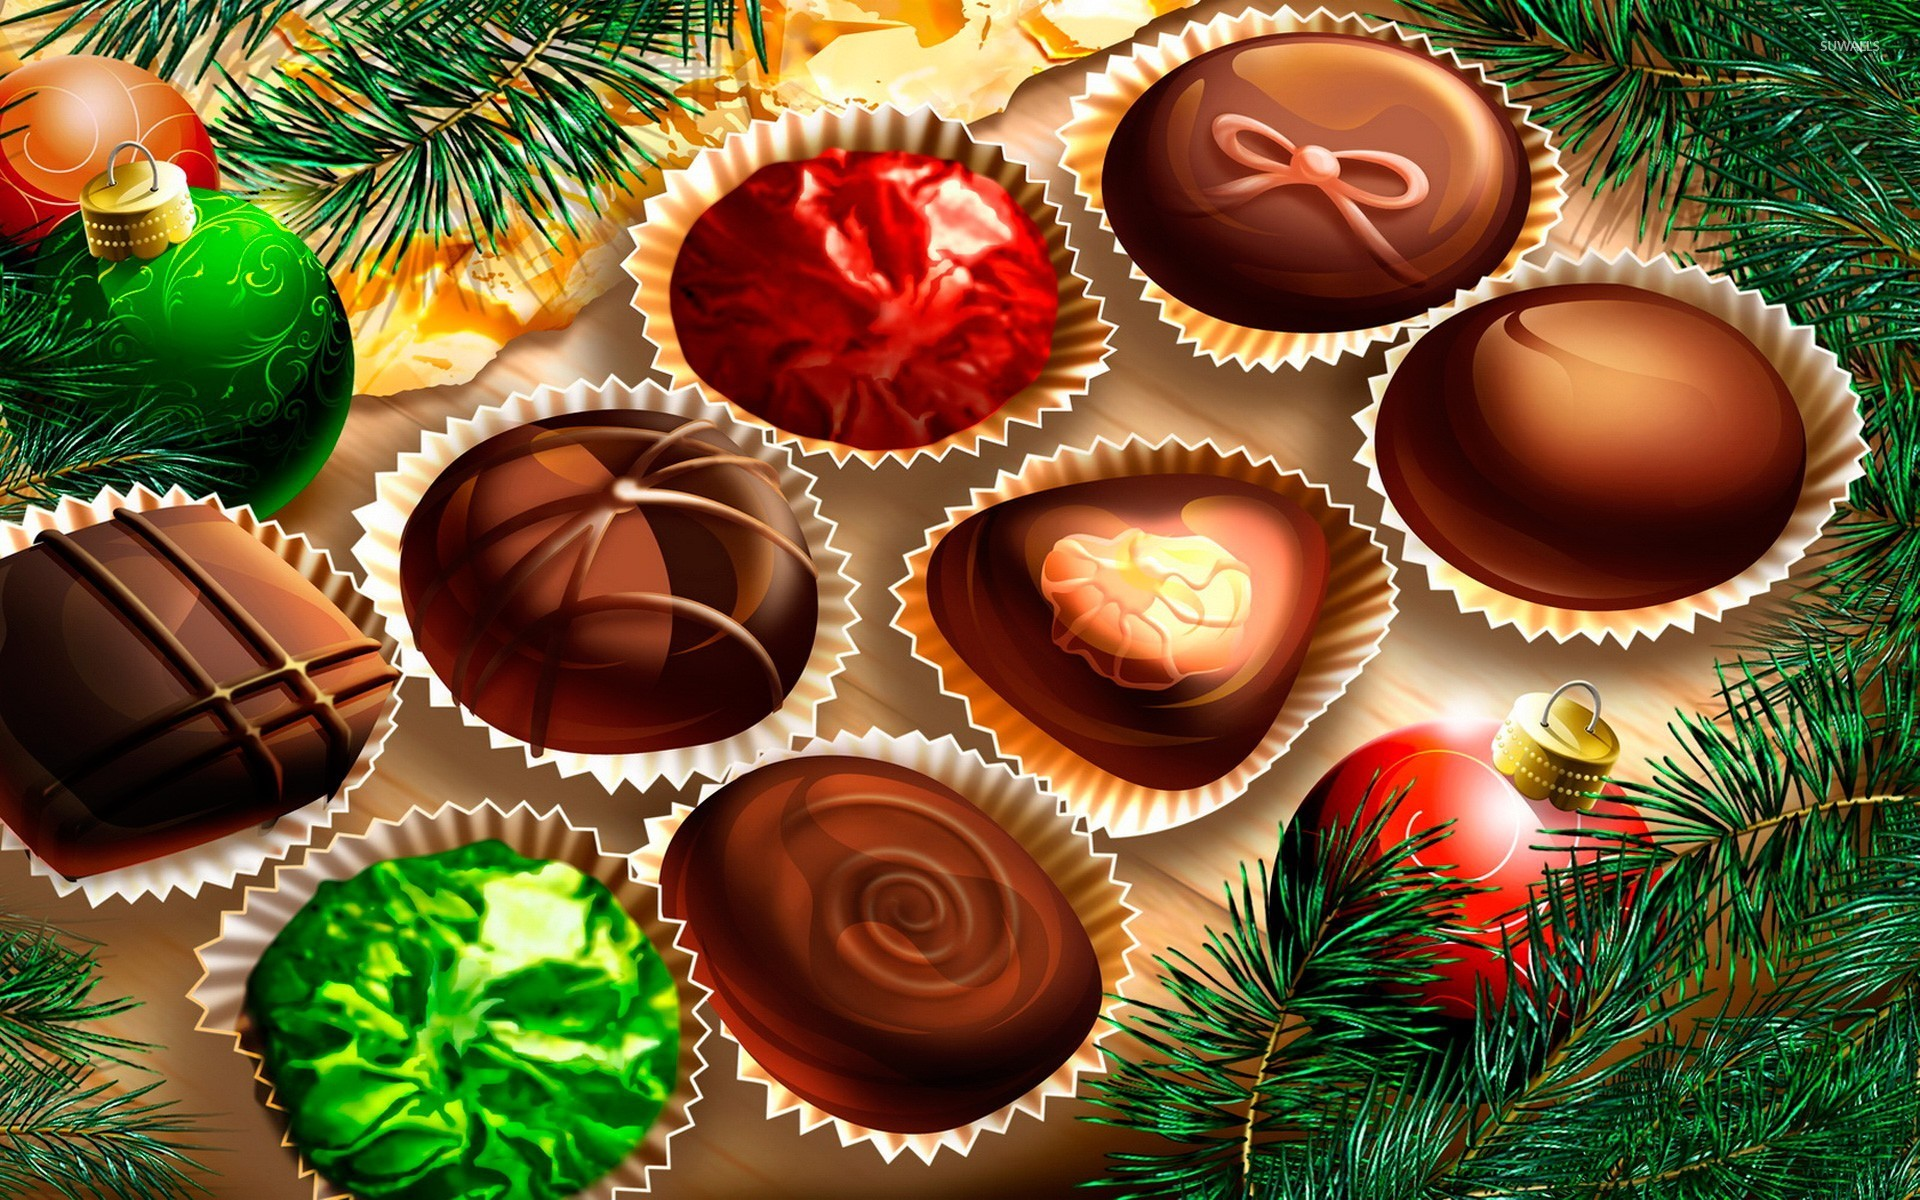 Chocolate bon bons wallpaper - Holiday wallpapers - #25212